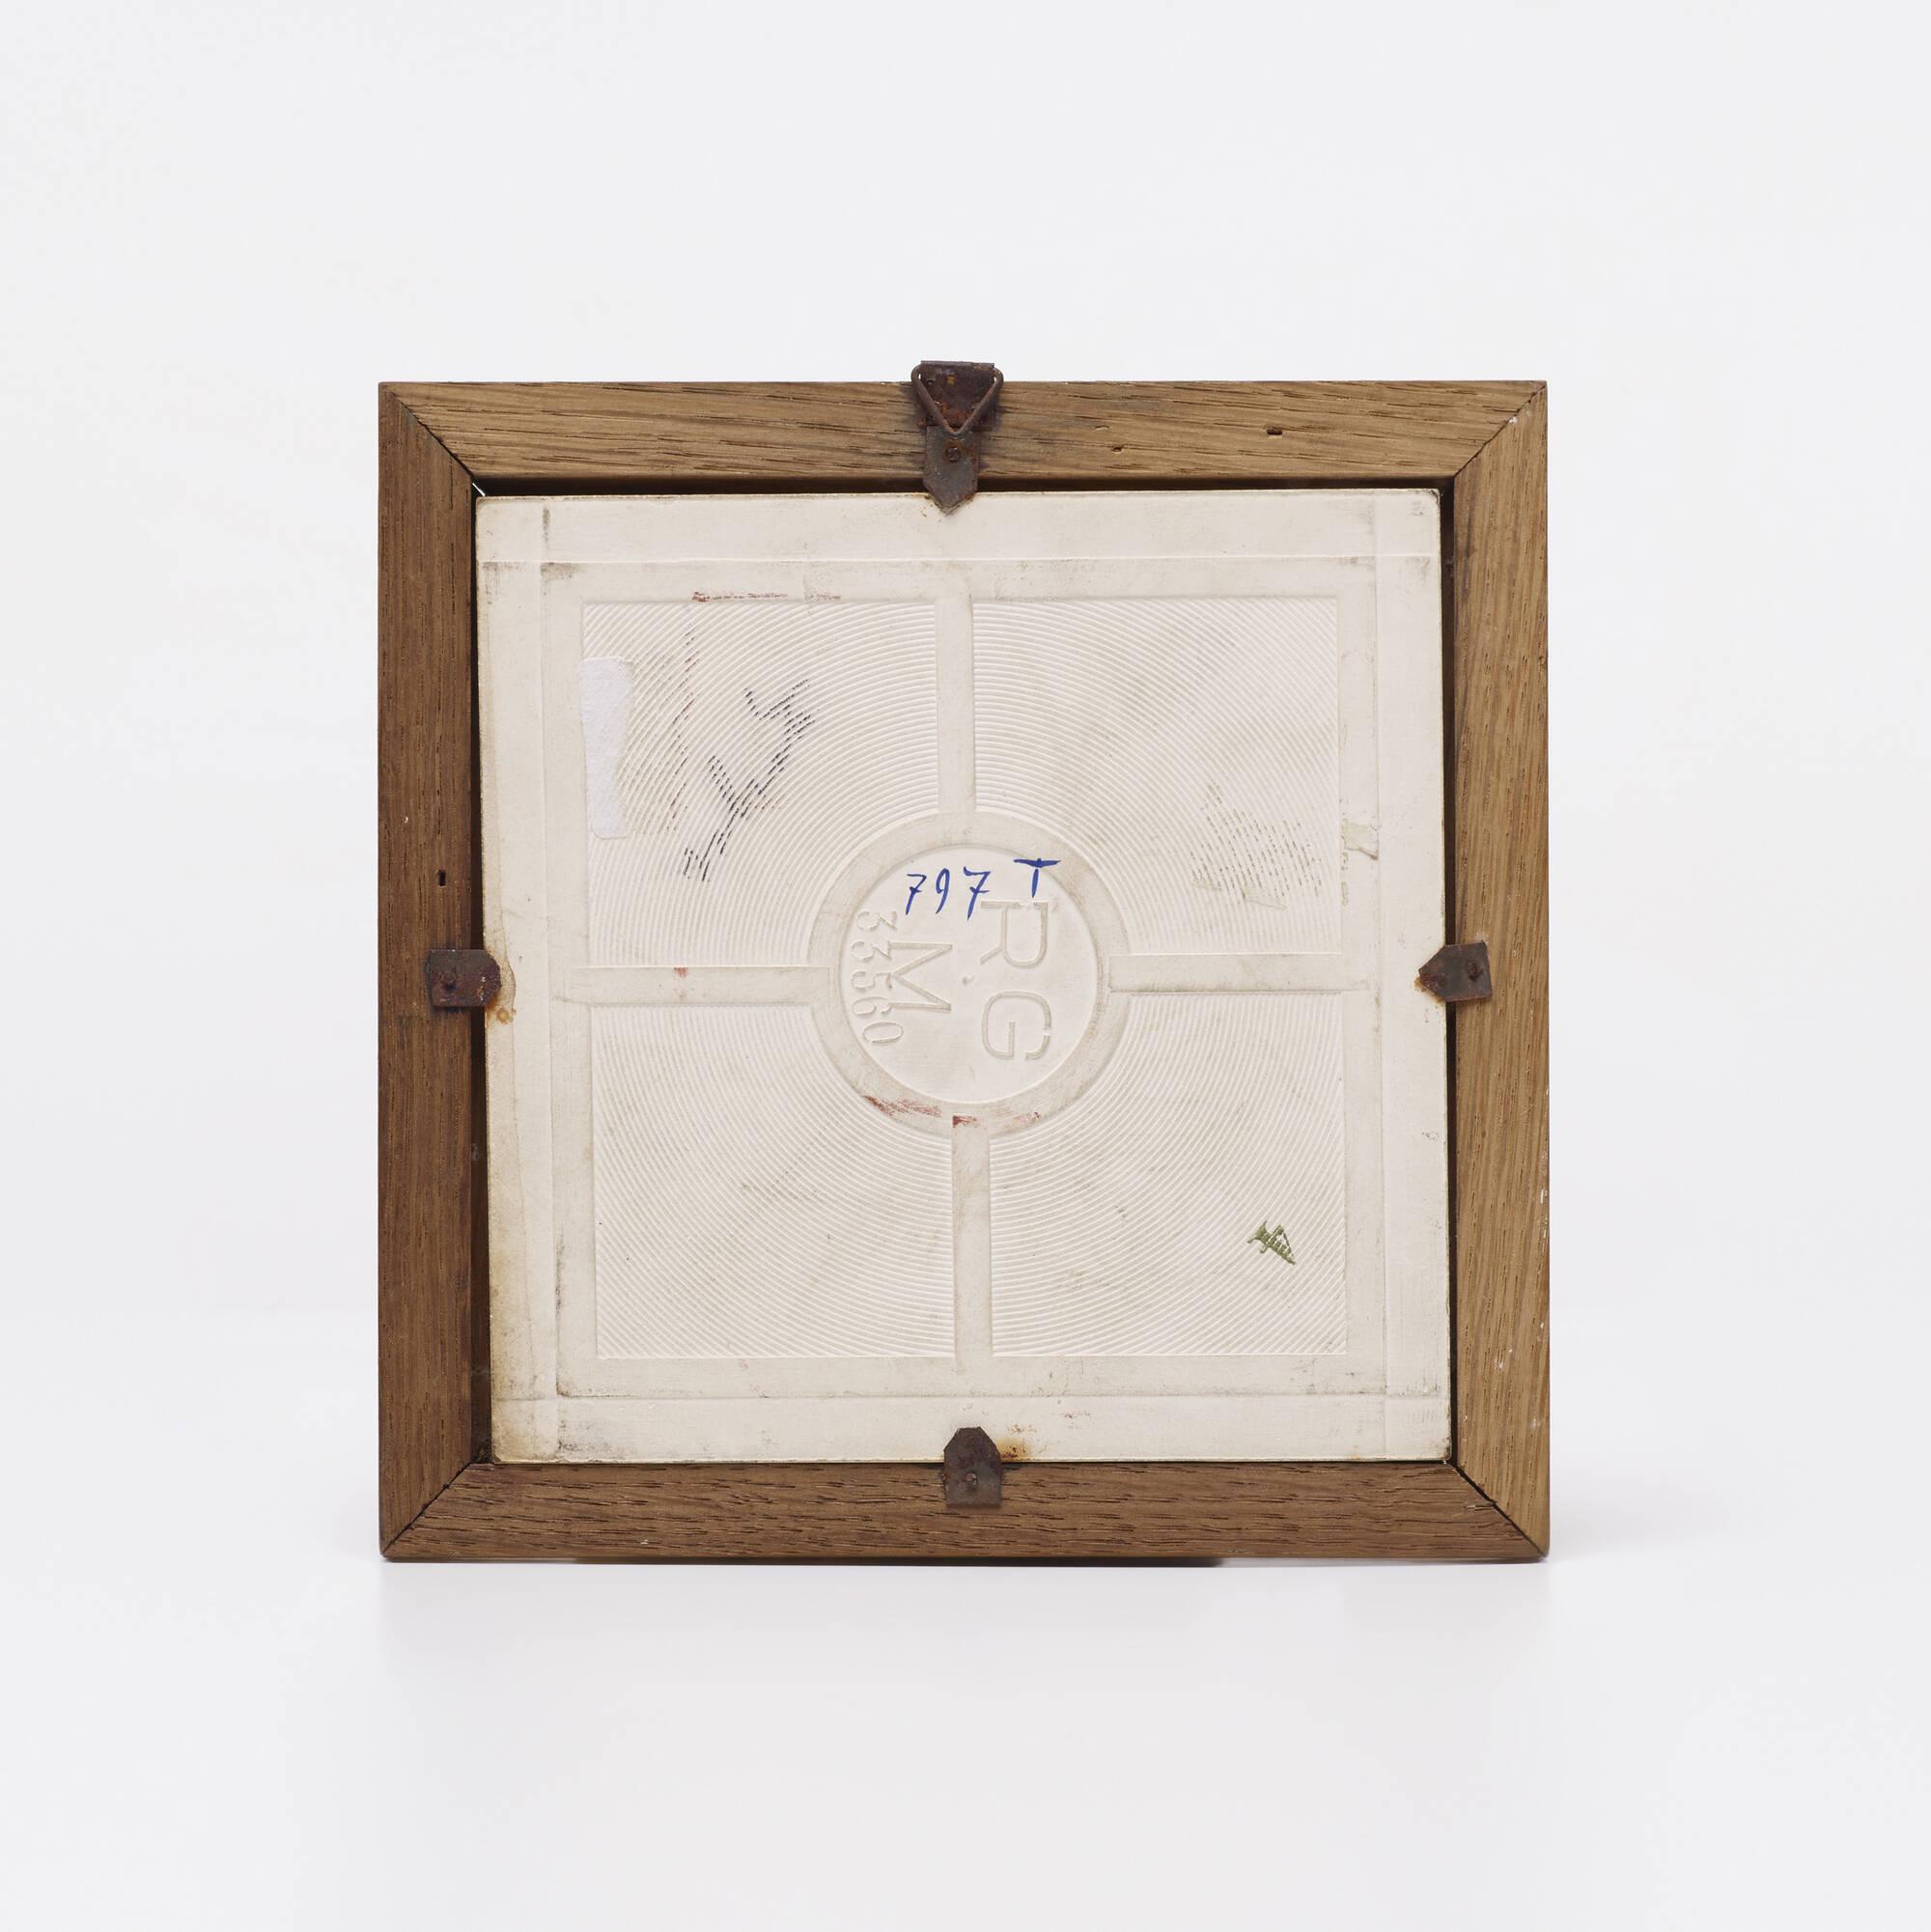 667: Gio Ponti, attribution / tiles, set of four (2 of 2)